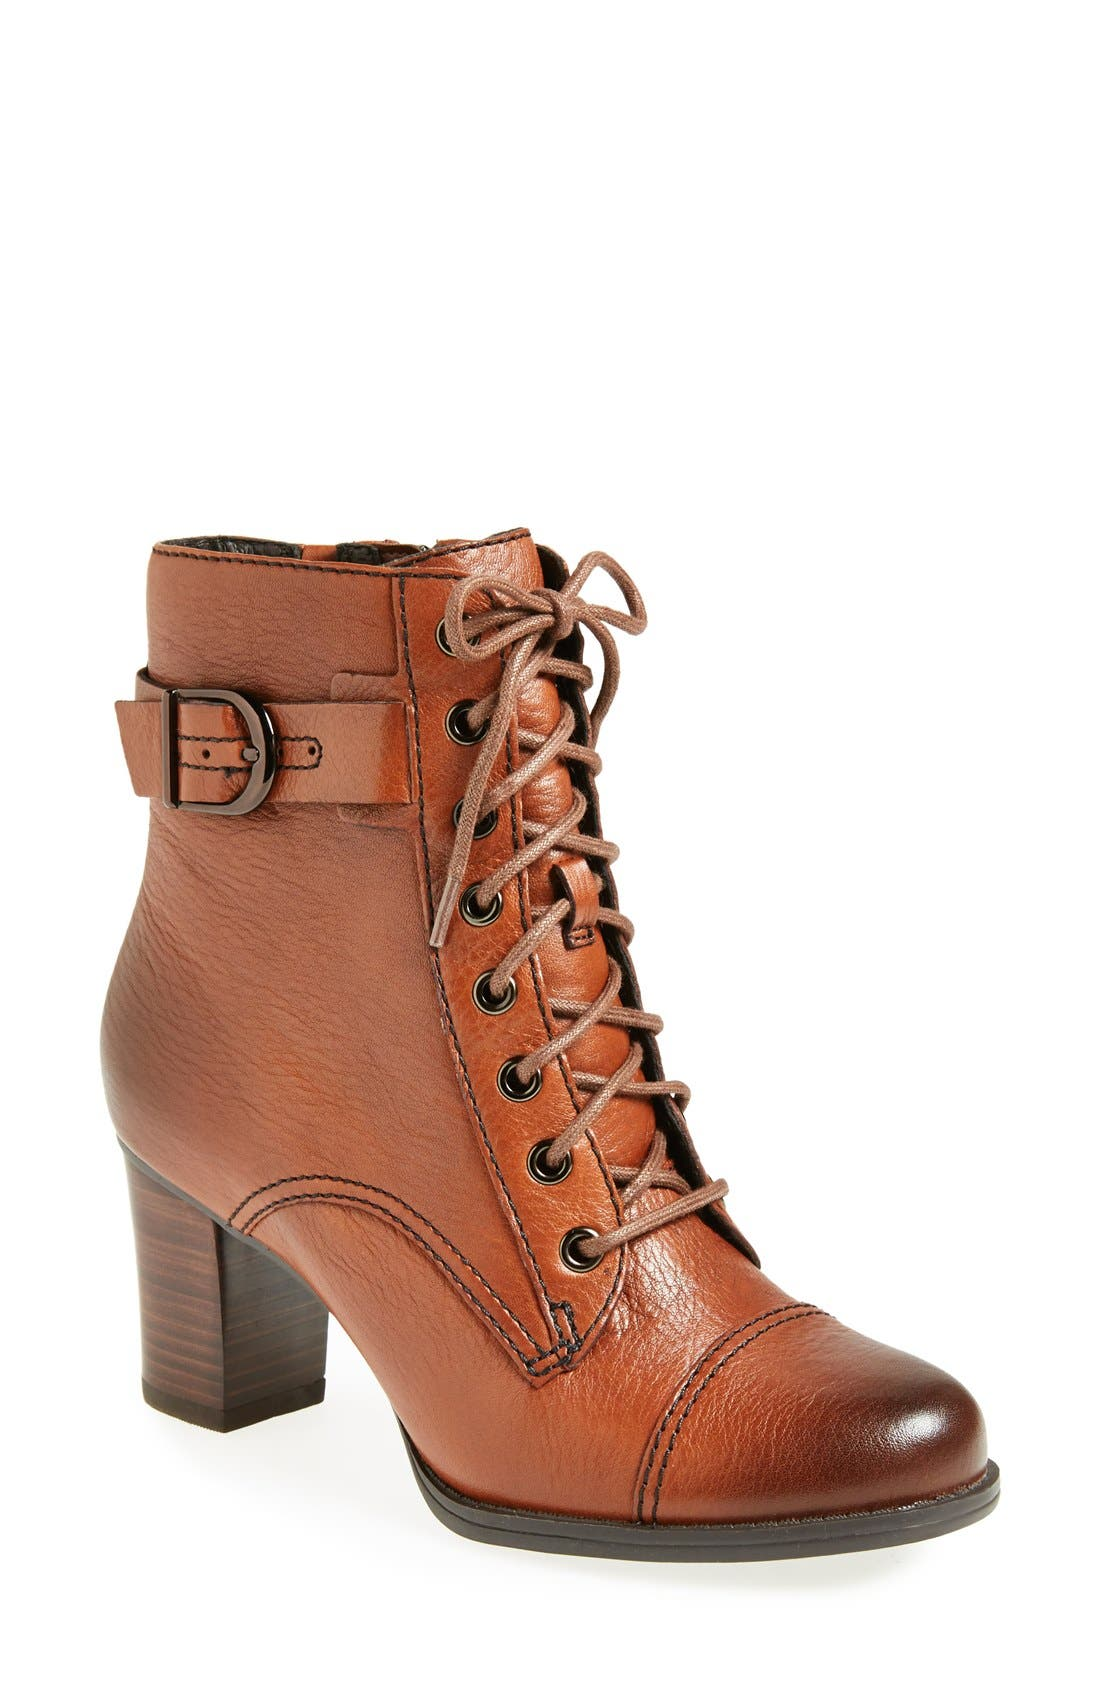 Alternate Image 1 Selected - Clarks® 'Jolissa Gypsum' Boot (Women)